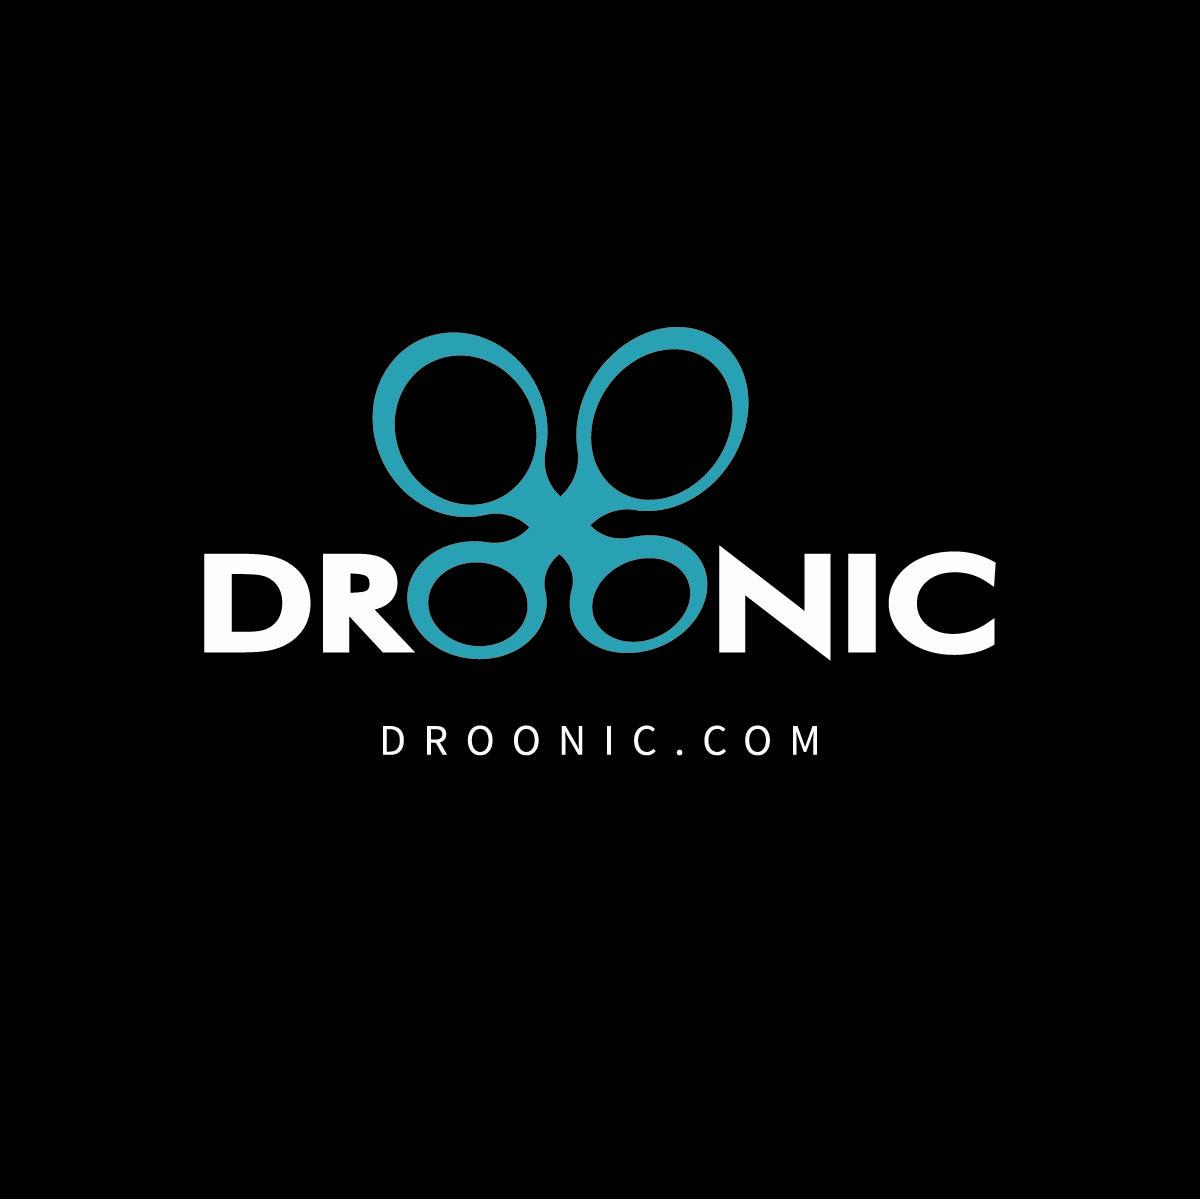 DROONIC - Drone Branding for sale - by Brandizle